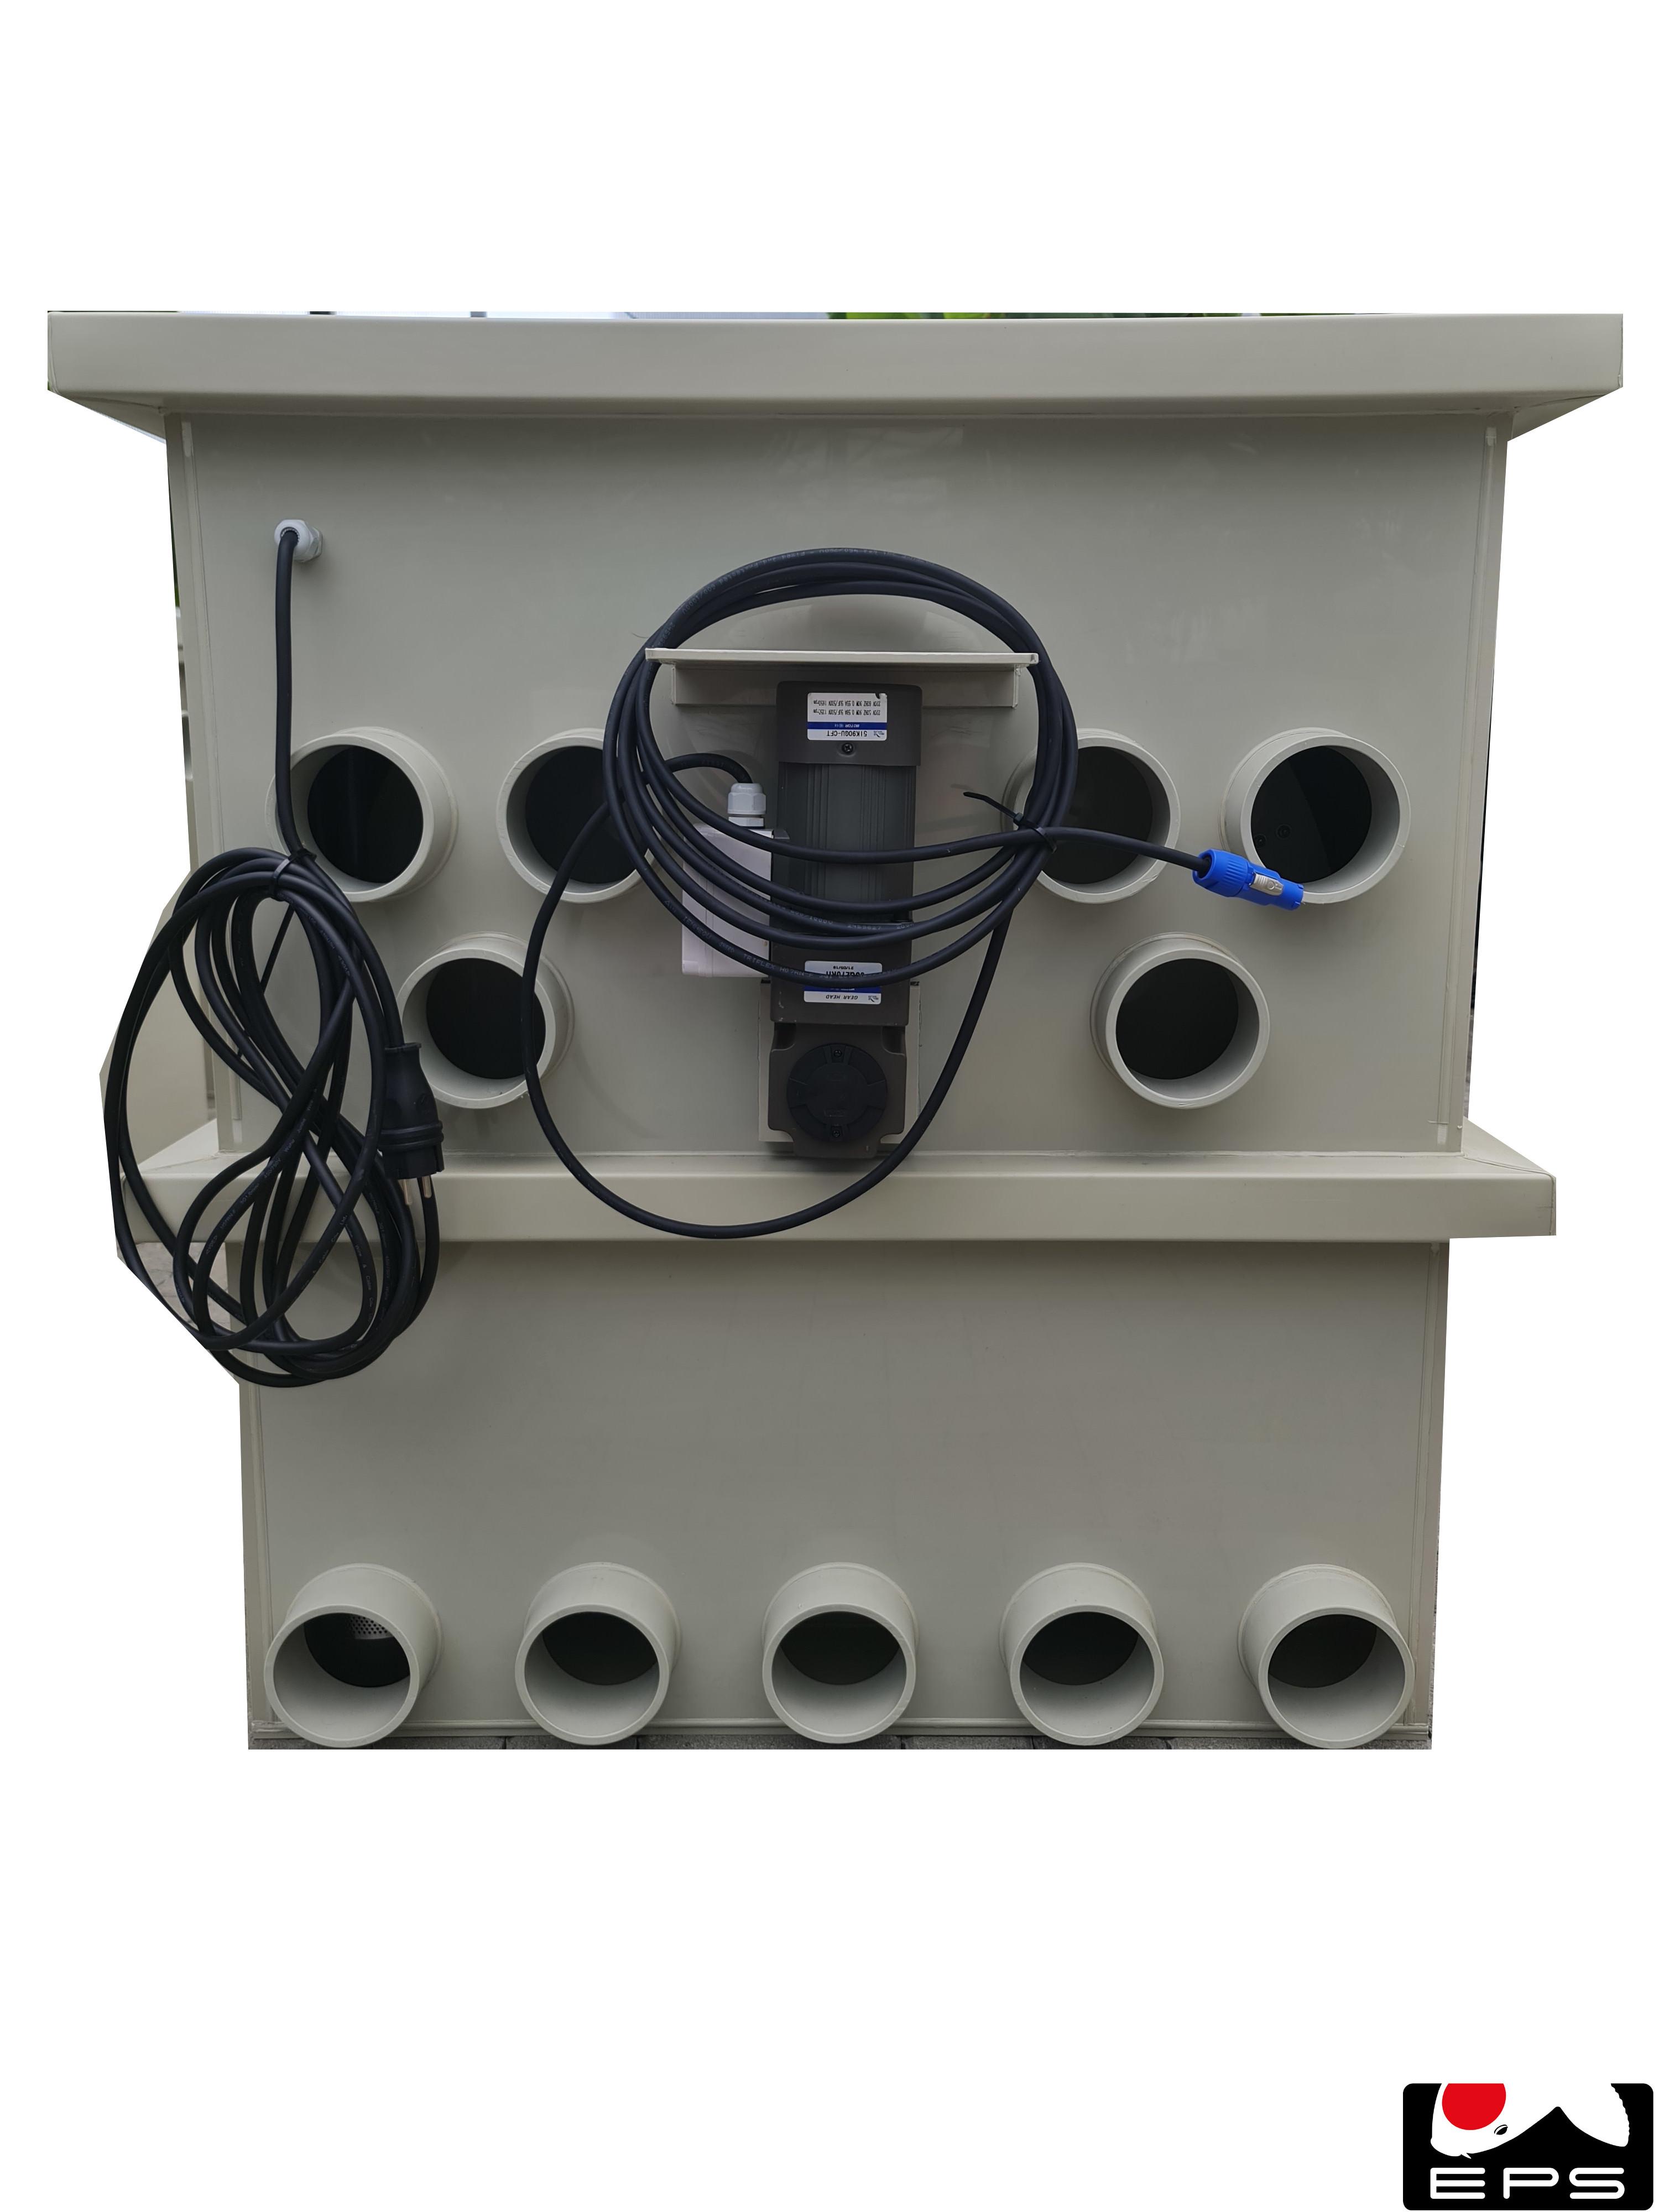 EPS Trommelfilter PP100 mit Spülpumpe